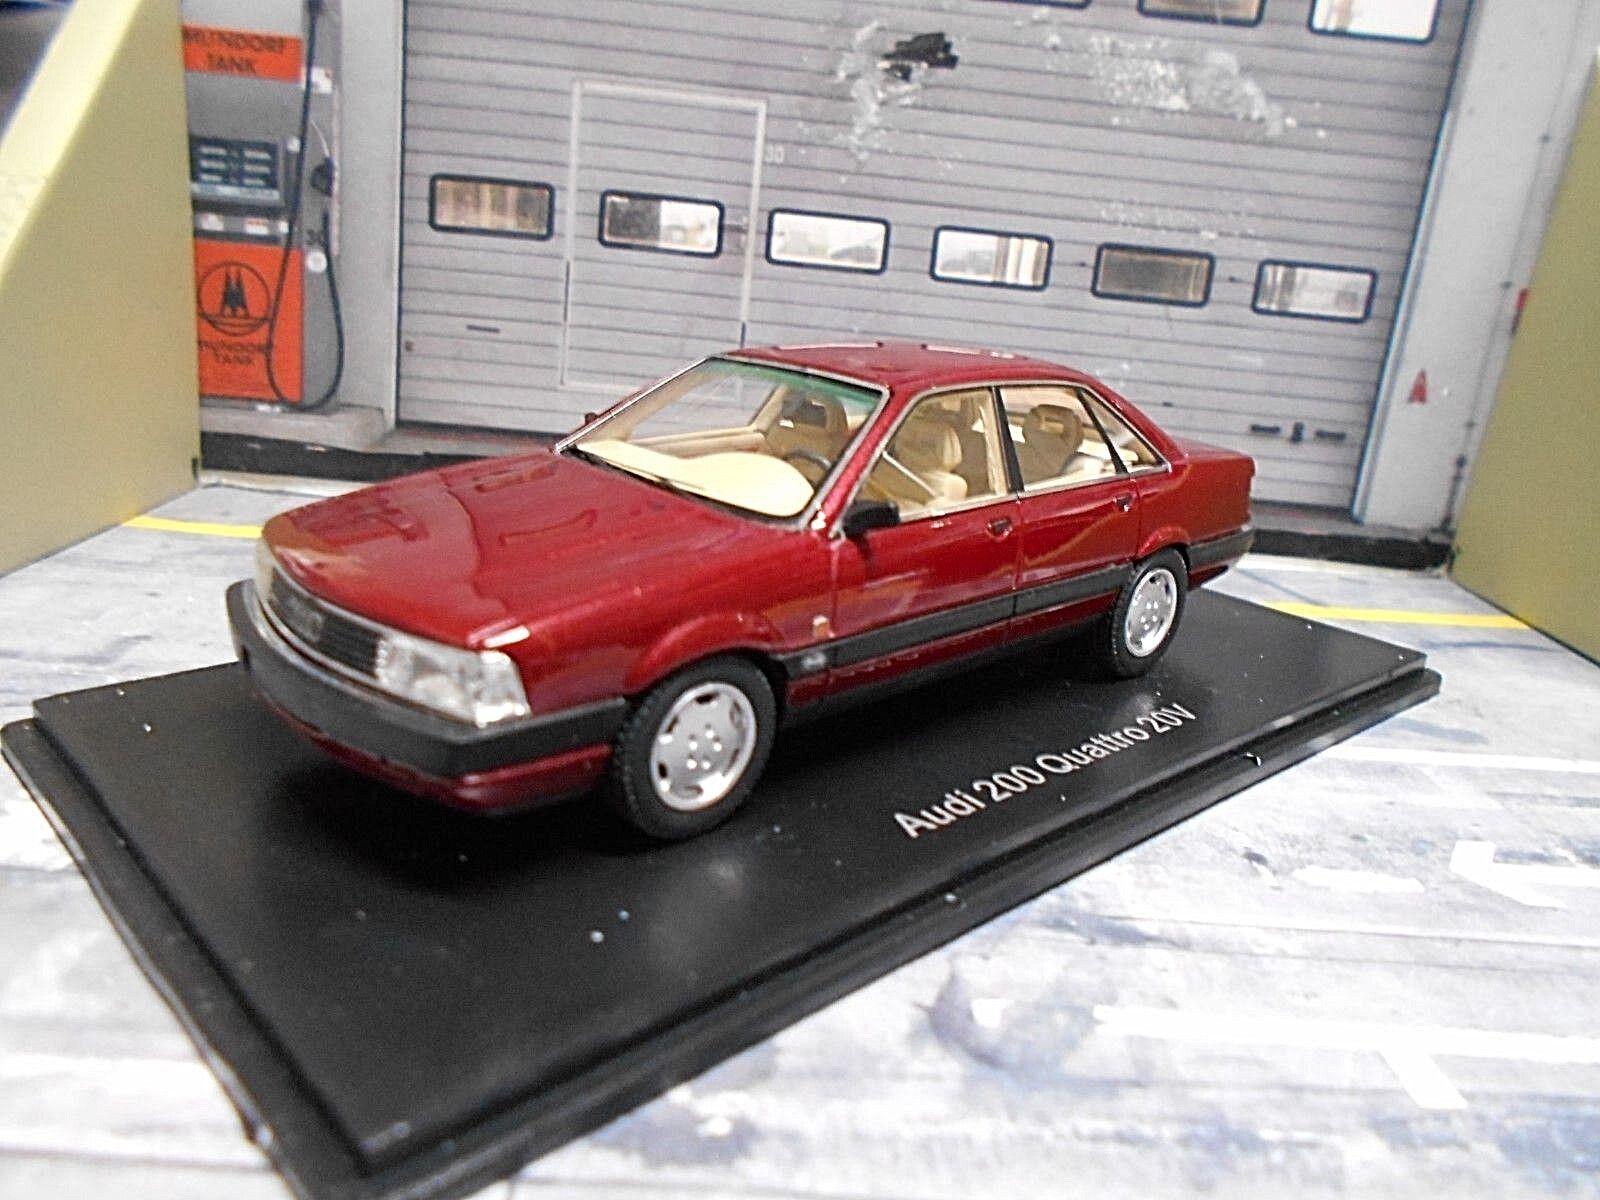 AUDI 200 QUATTRO 20 V Turbo Metallic Foncé Rouge rouge 1990 NEO Resin neuf 1 43